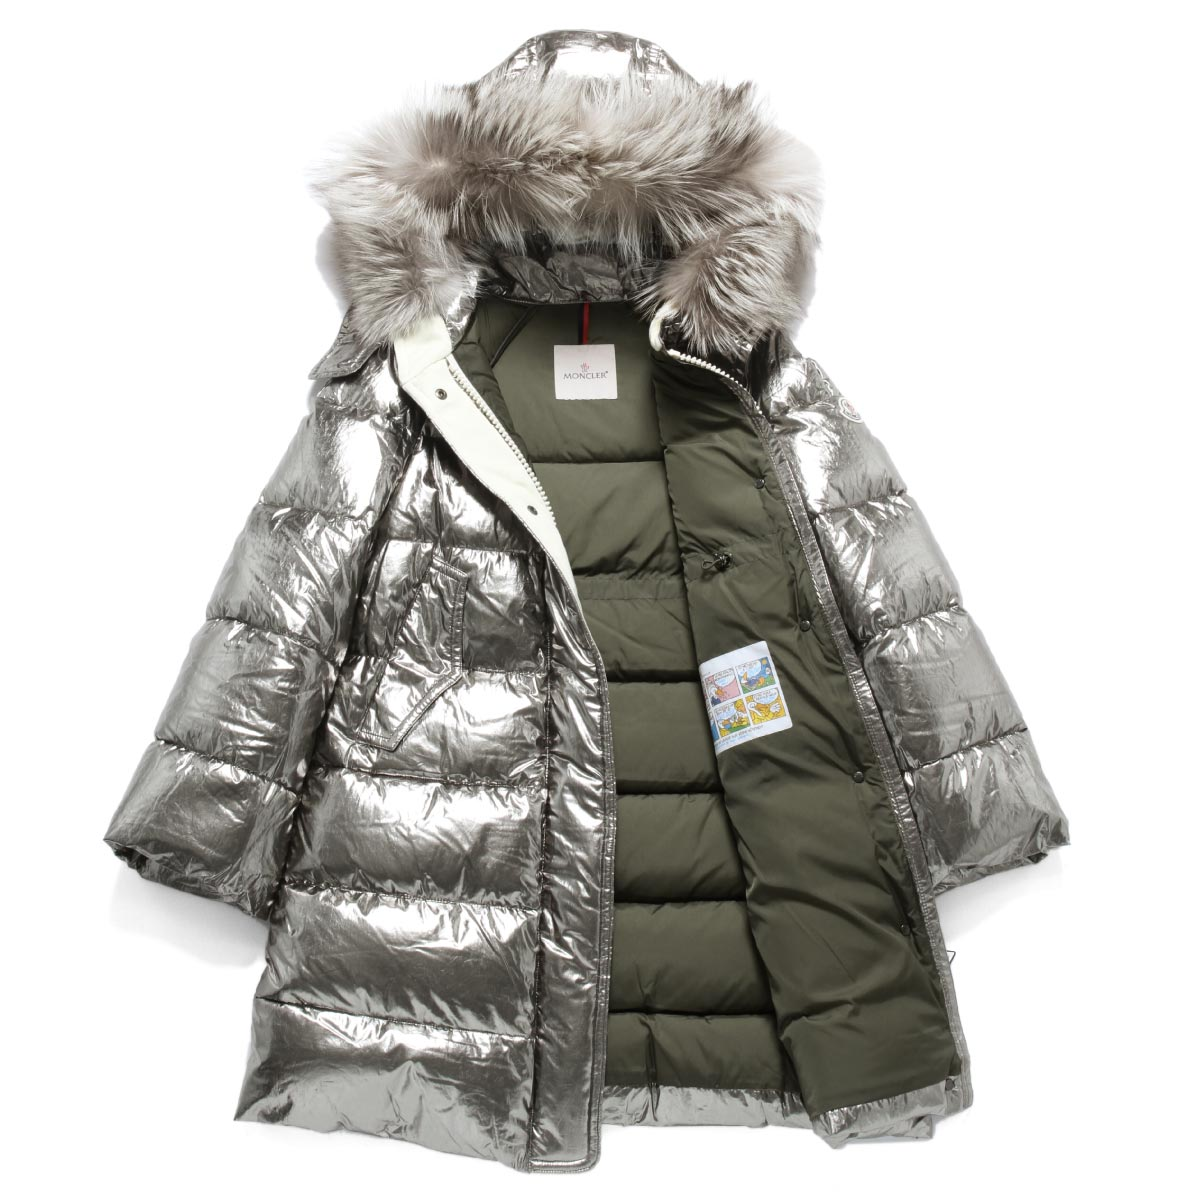 moncler jacket silver